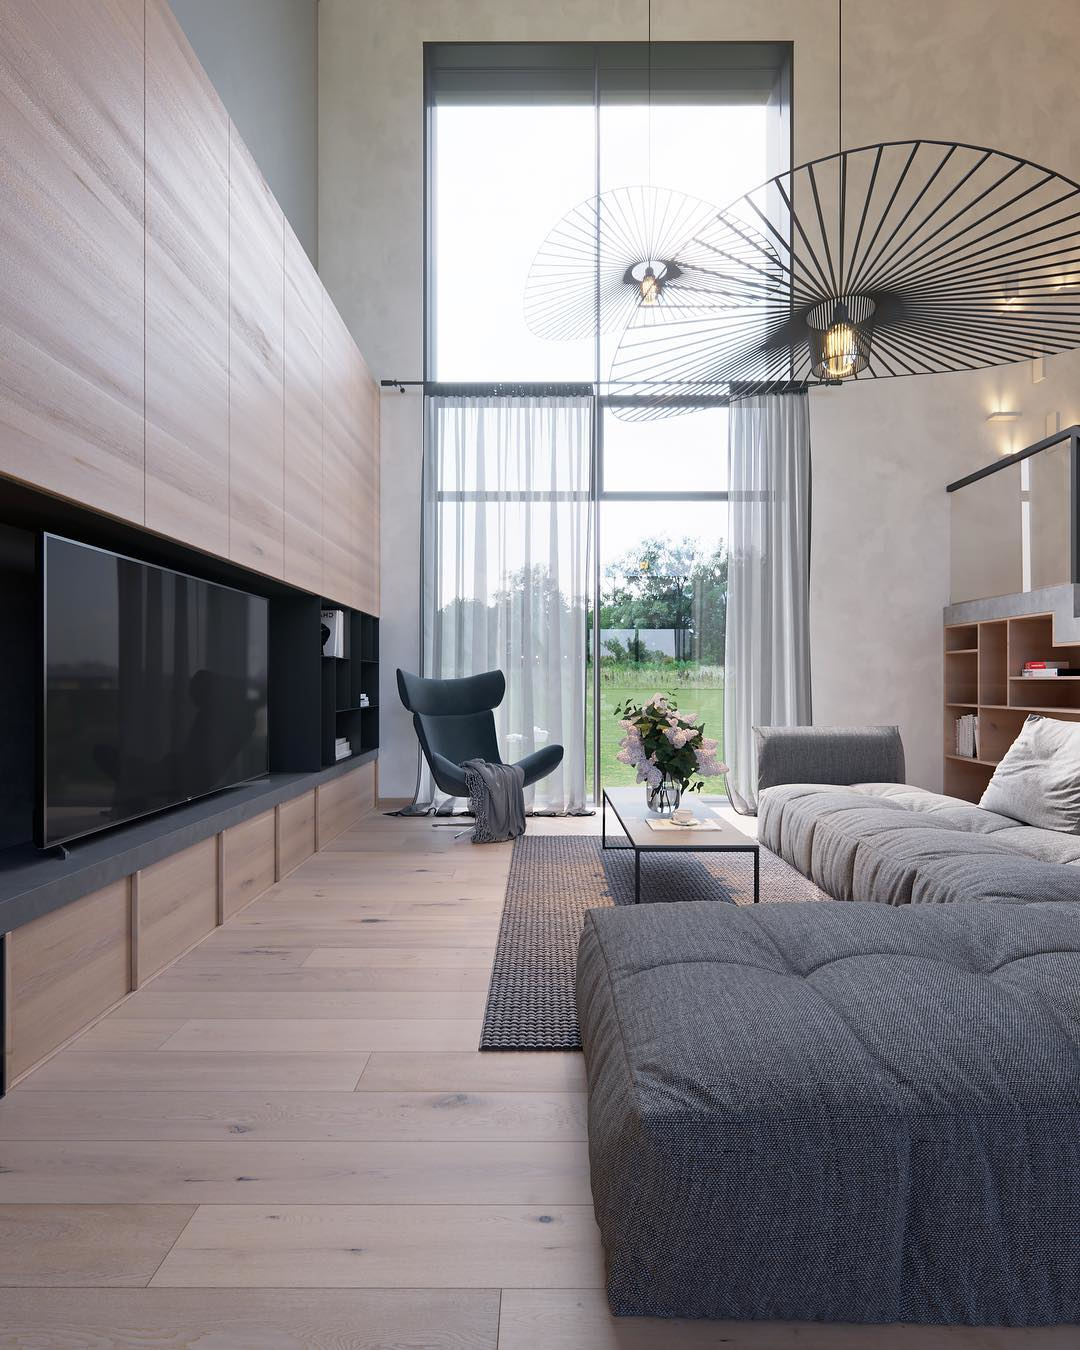 Vertigo Pendant Lamp La Suspension Lustre Replica Shopify Living Room Modern Living Room Decor Und Beautiful Living Rooms